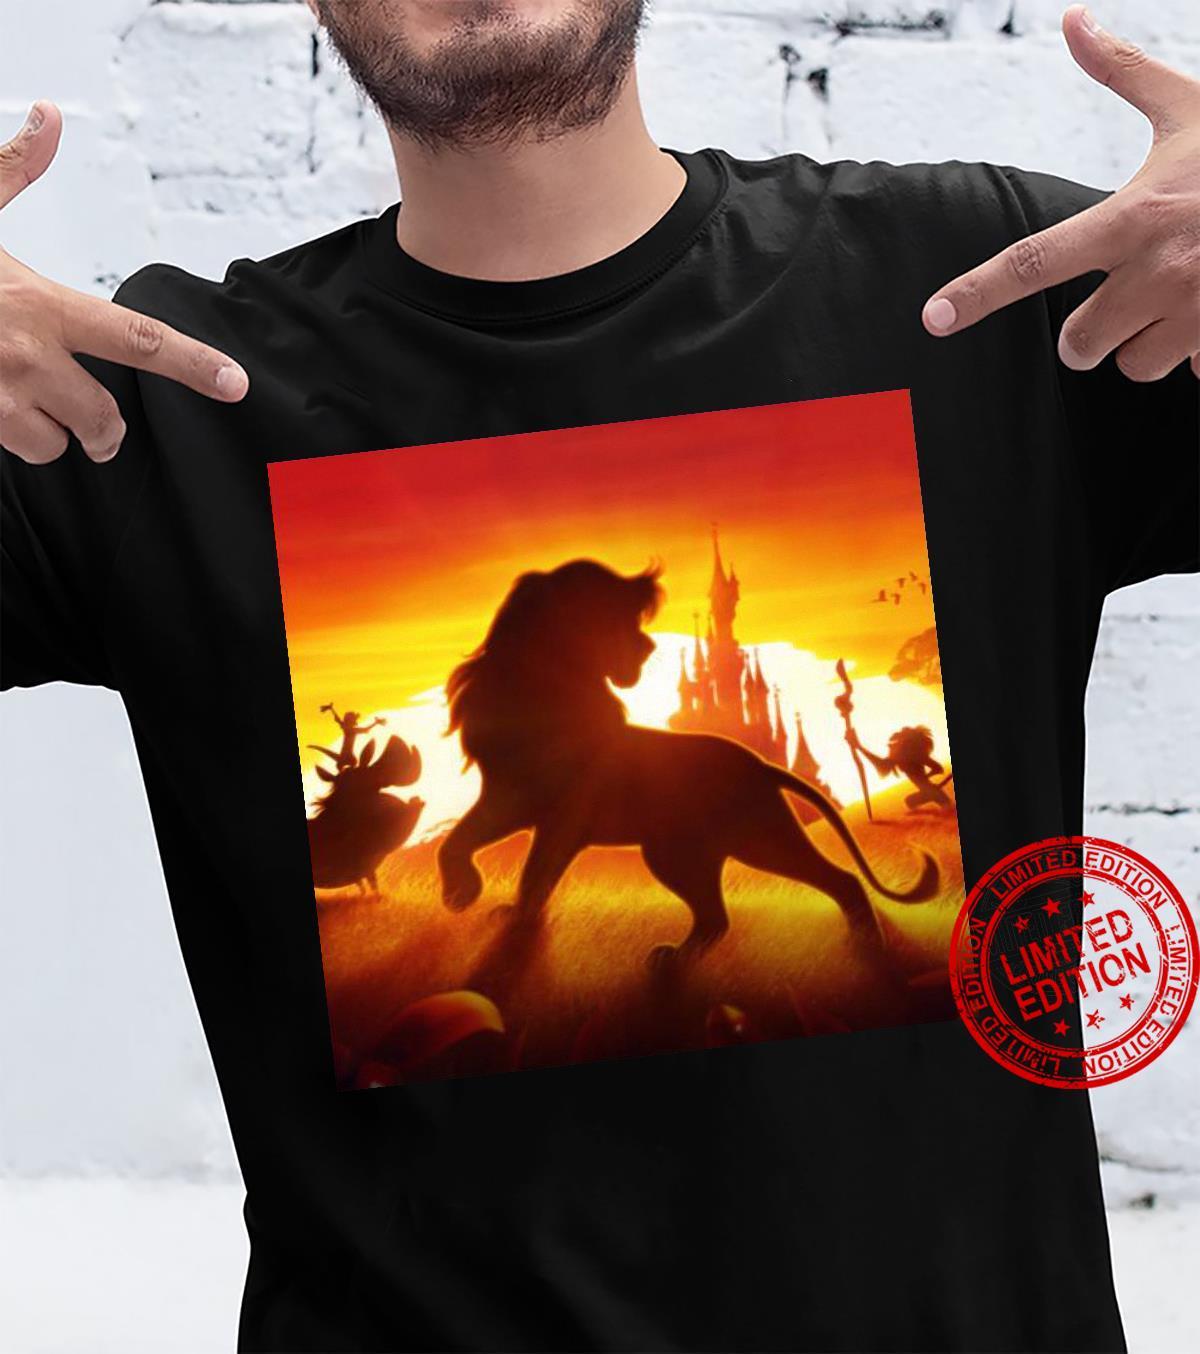 The Lion King & Jungle Festival shirt